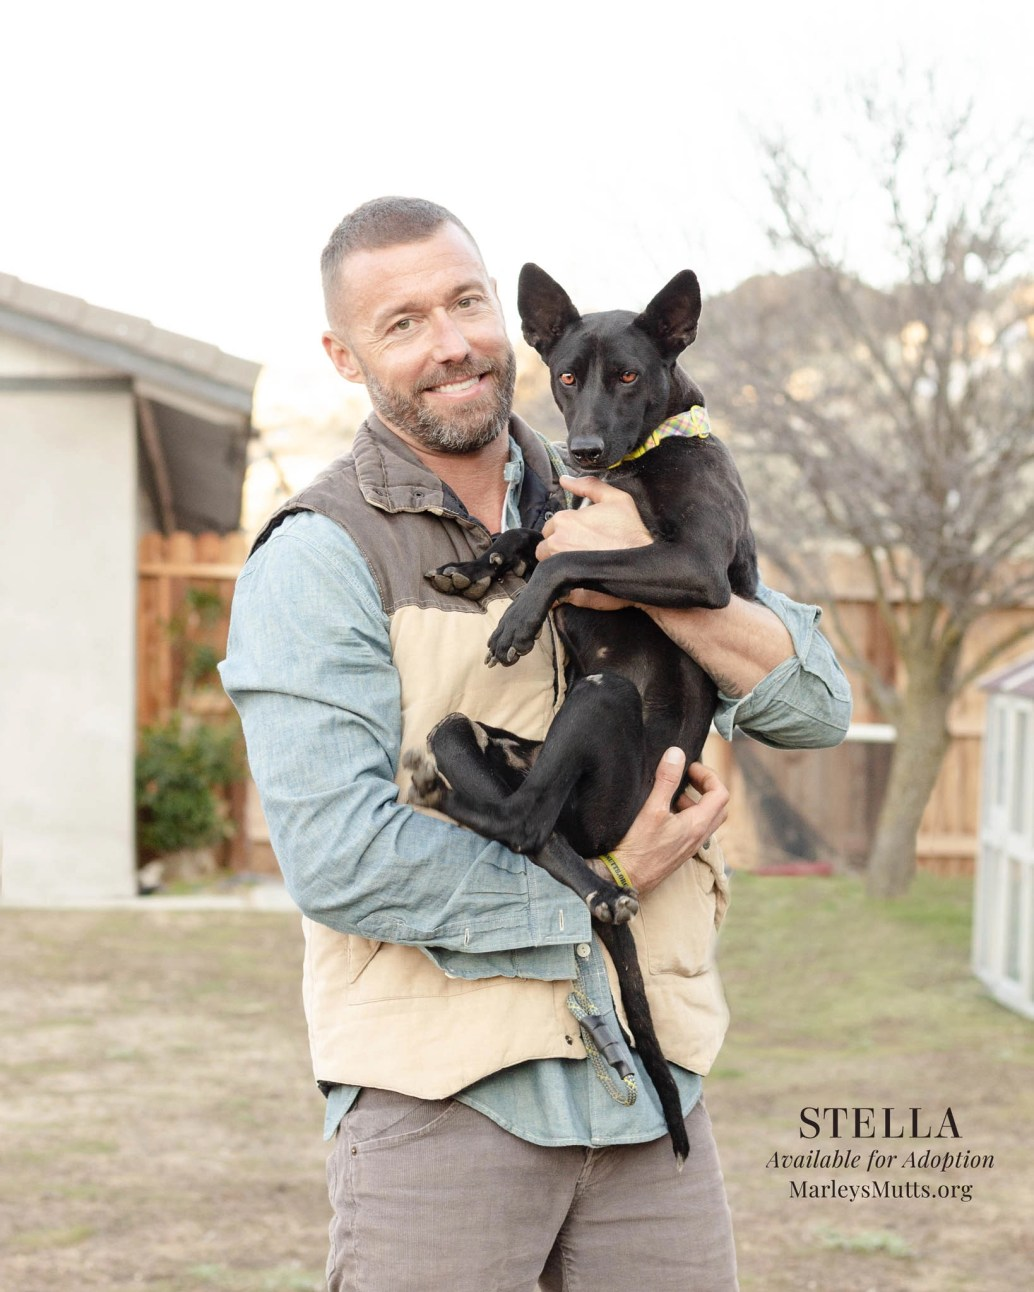 IMG_4930-Stella-and-Zach-Looking-at-Camera-2048x1638